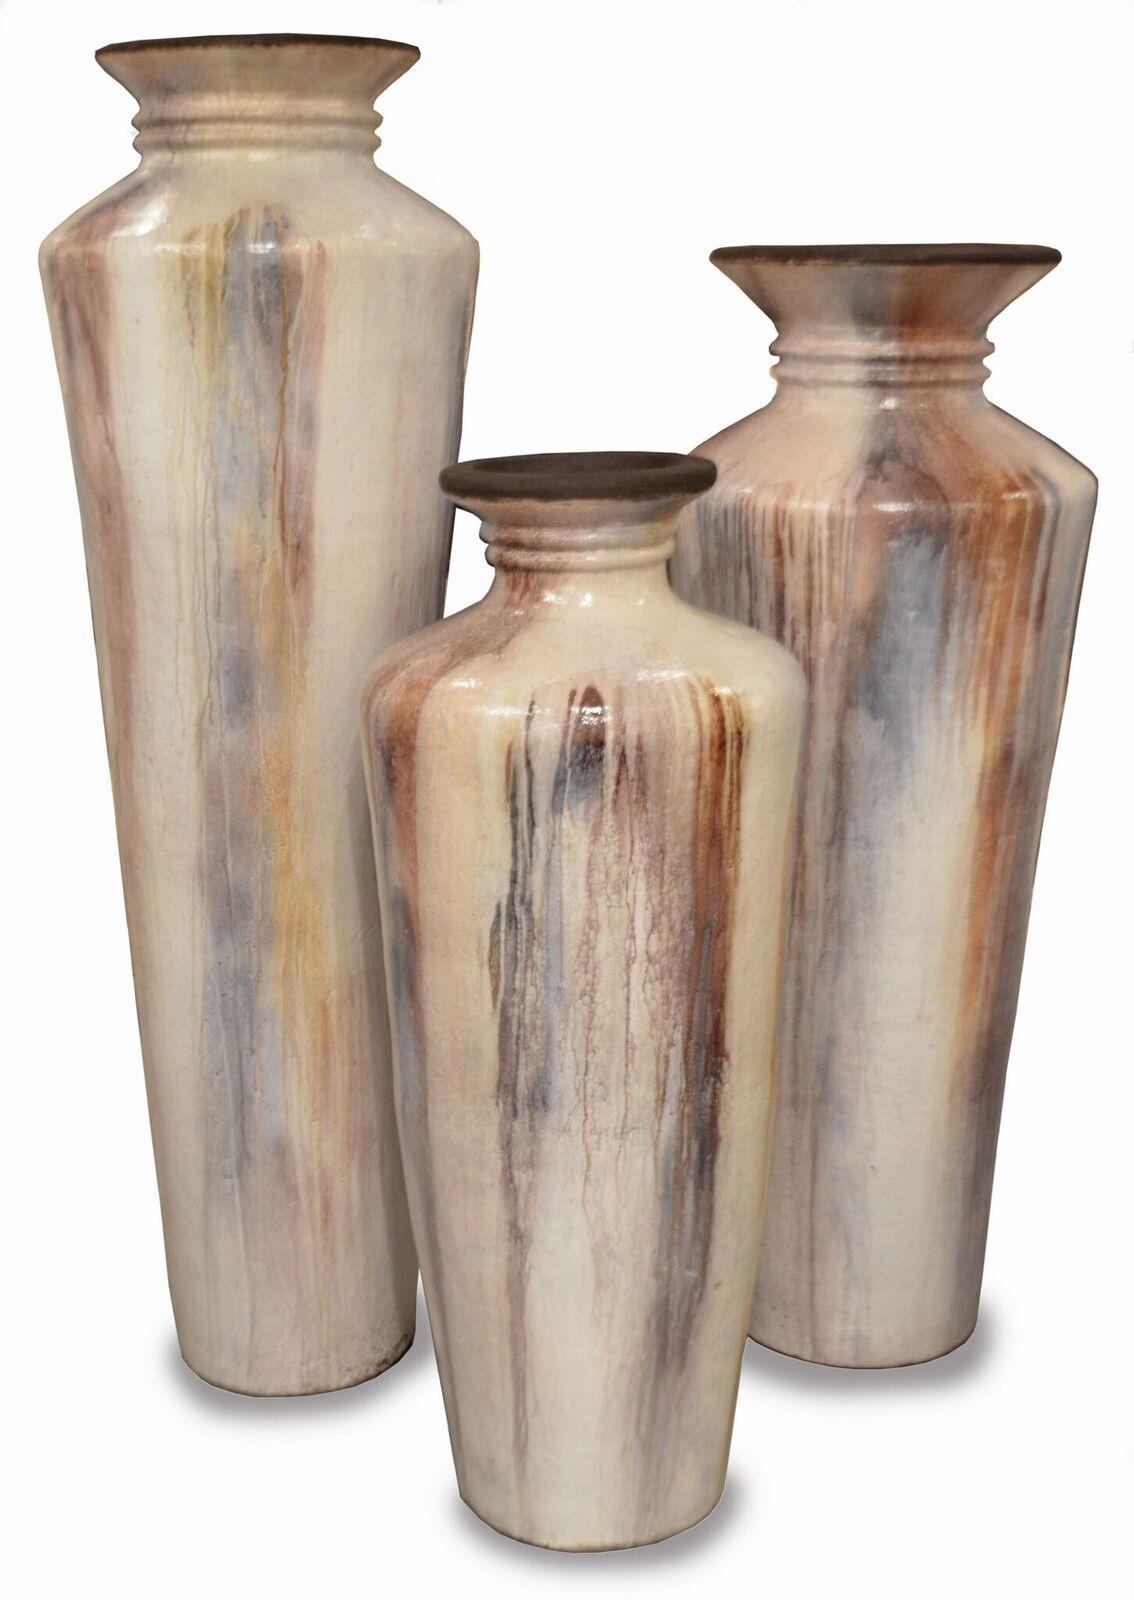 Pin by lea lyons on home decor pinterest floor vases large vases home decor homemade home decor tall floor vases house design reviewsmspy